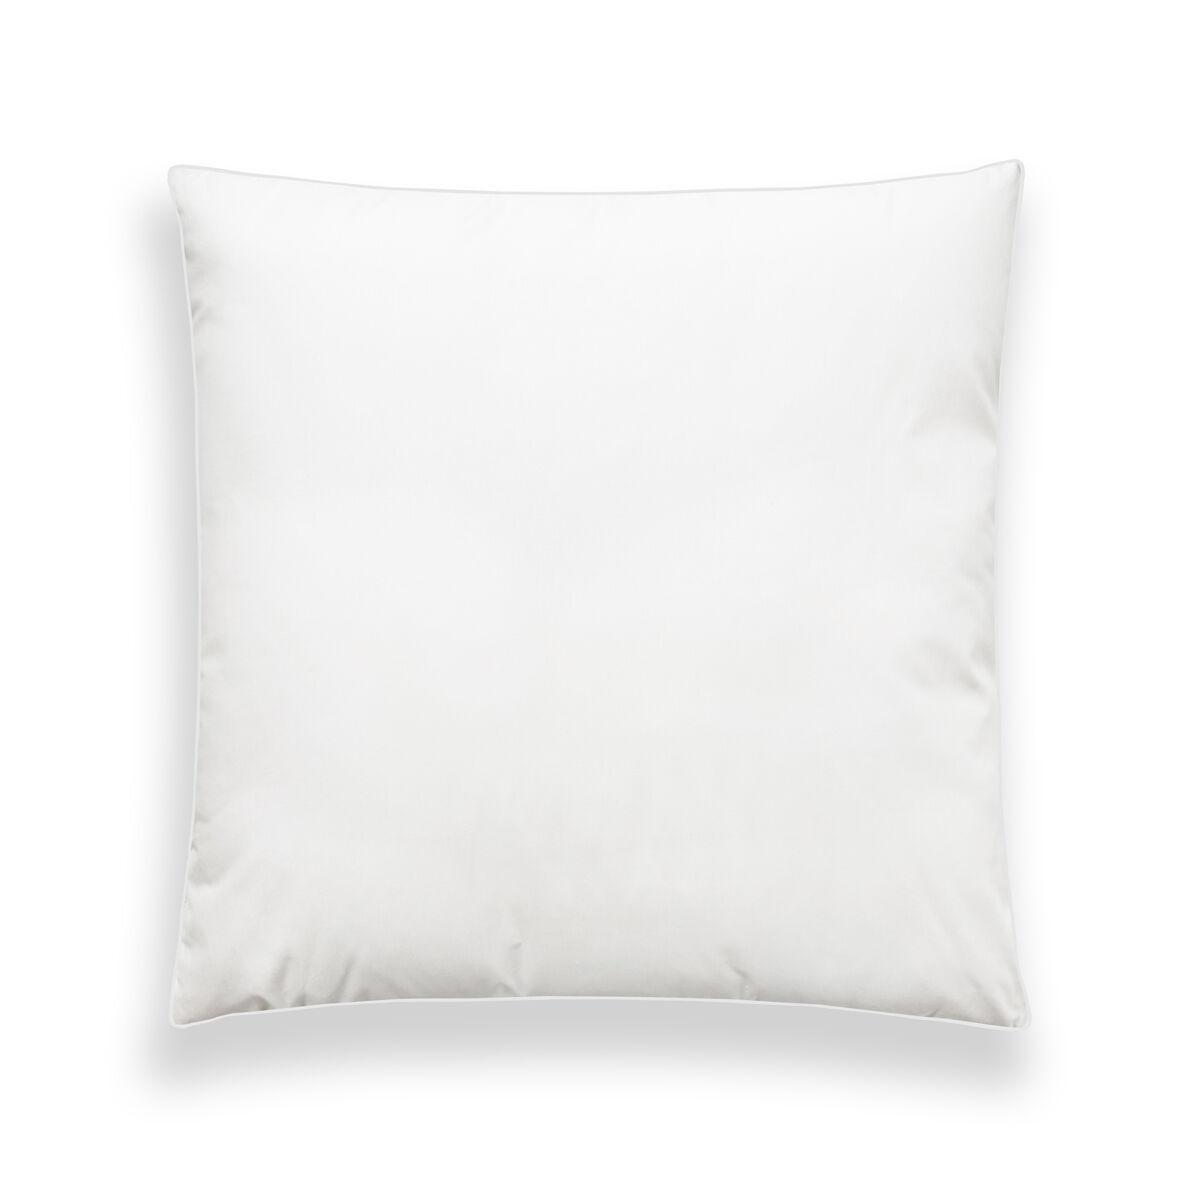 WAKE ME GREEN Oreiller FERME 10% Duvet Anti-acariens - Coton Bio  65x65 cm